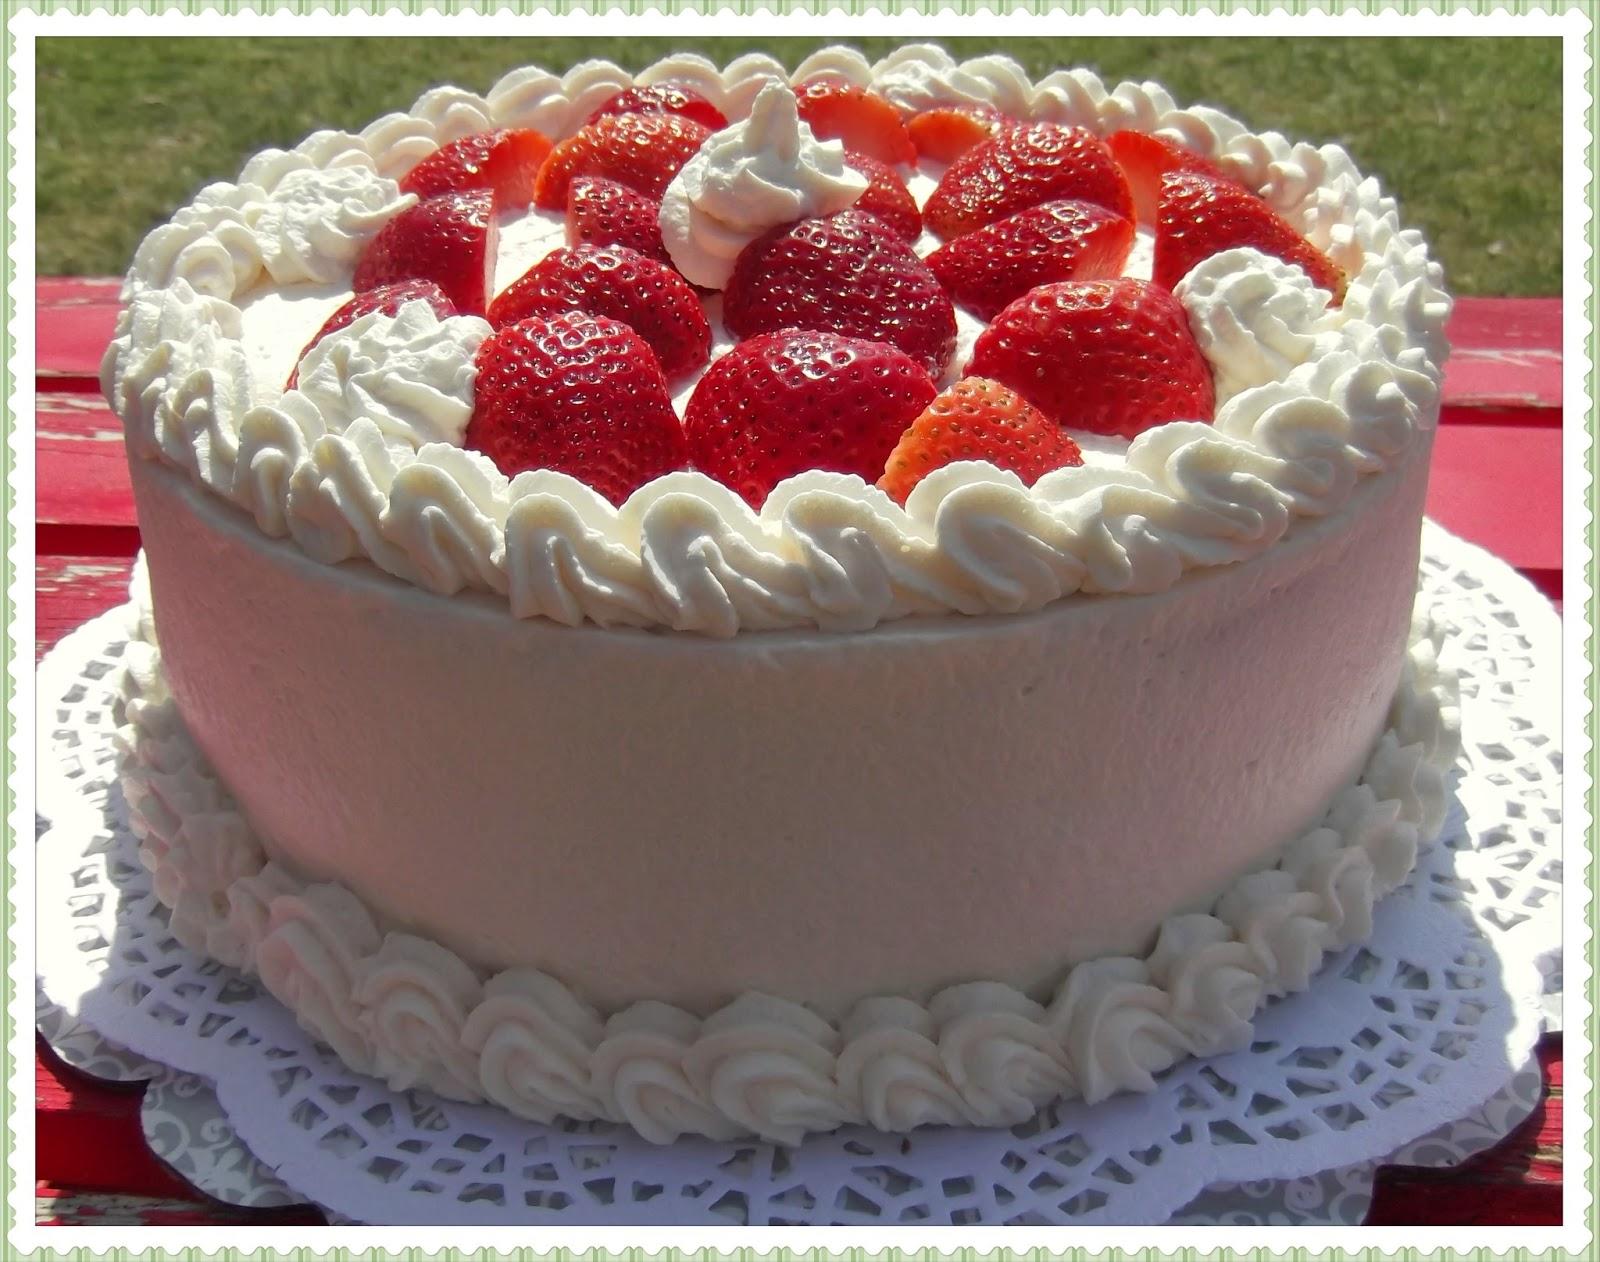 Cake for strawberry shortcake recipe